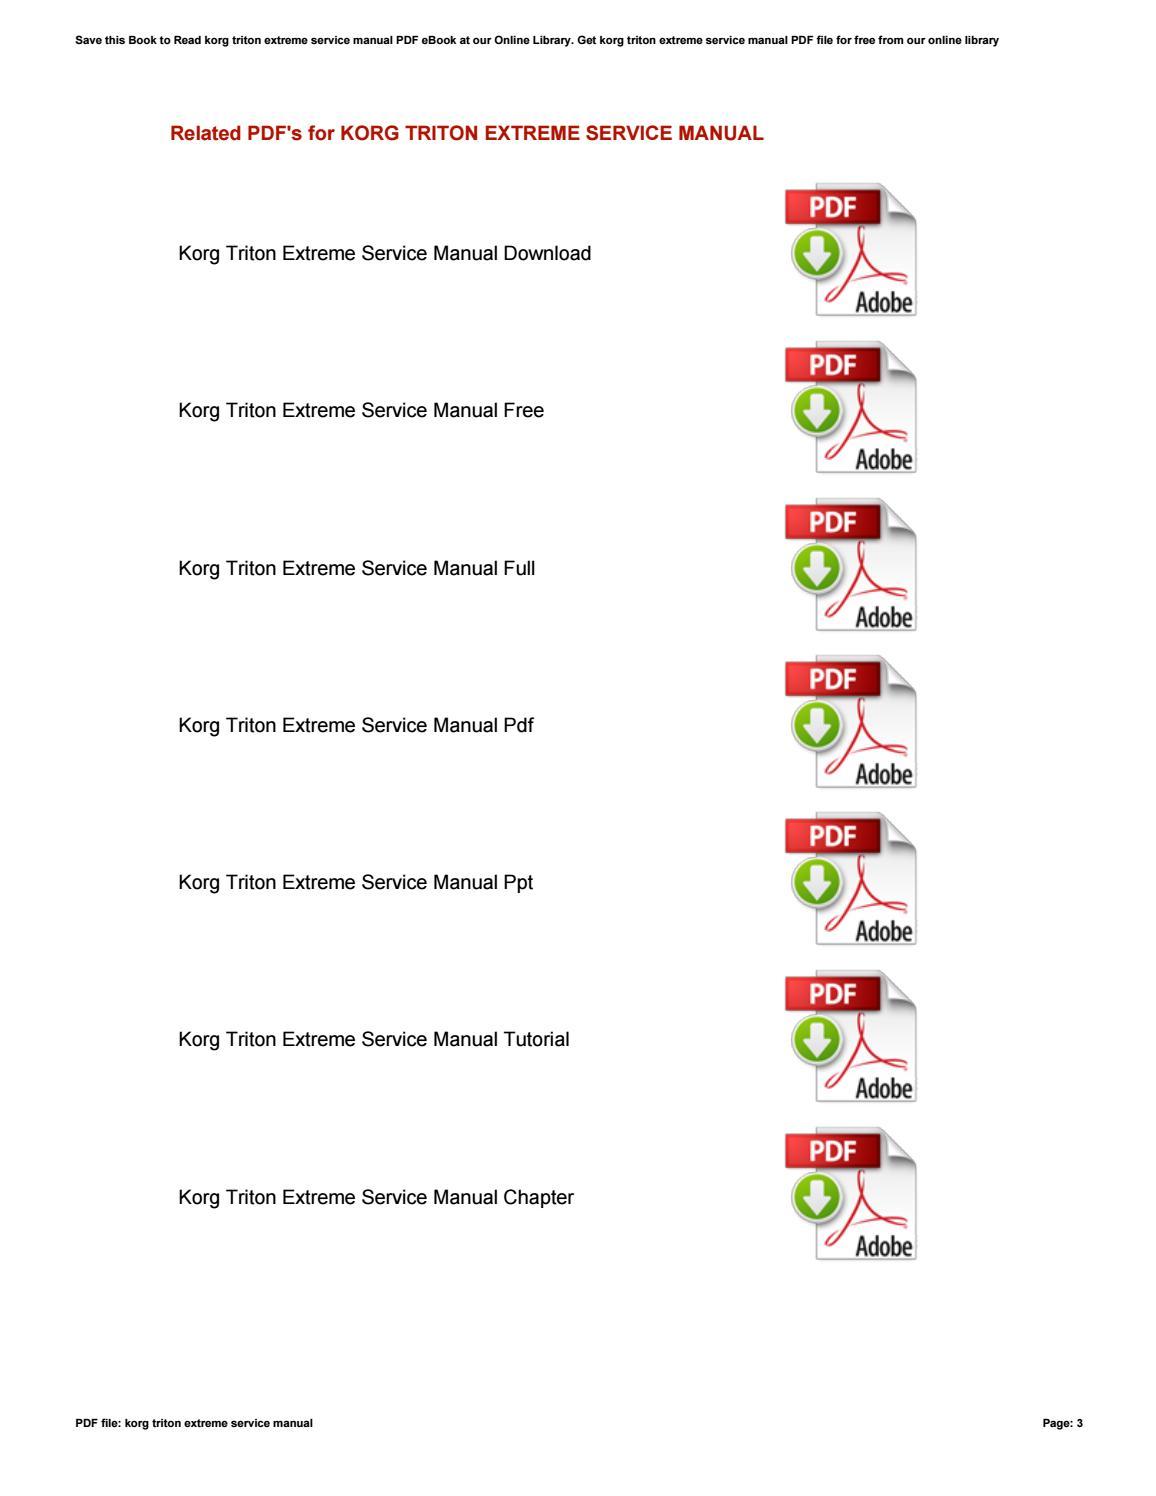 Korg triton extreme service manual by NorrisRandall2987